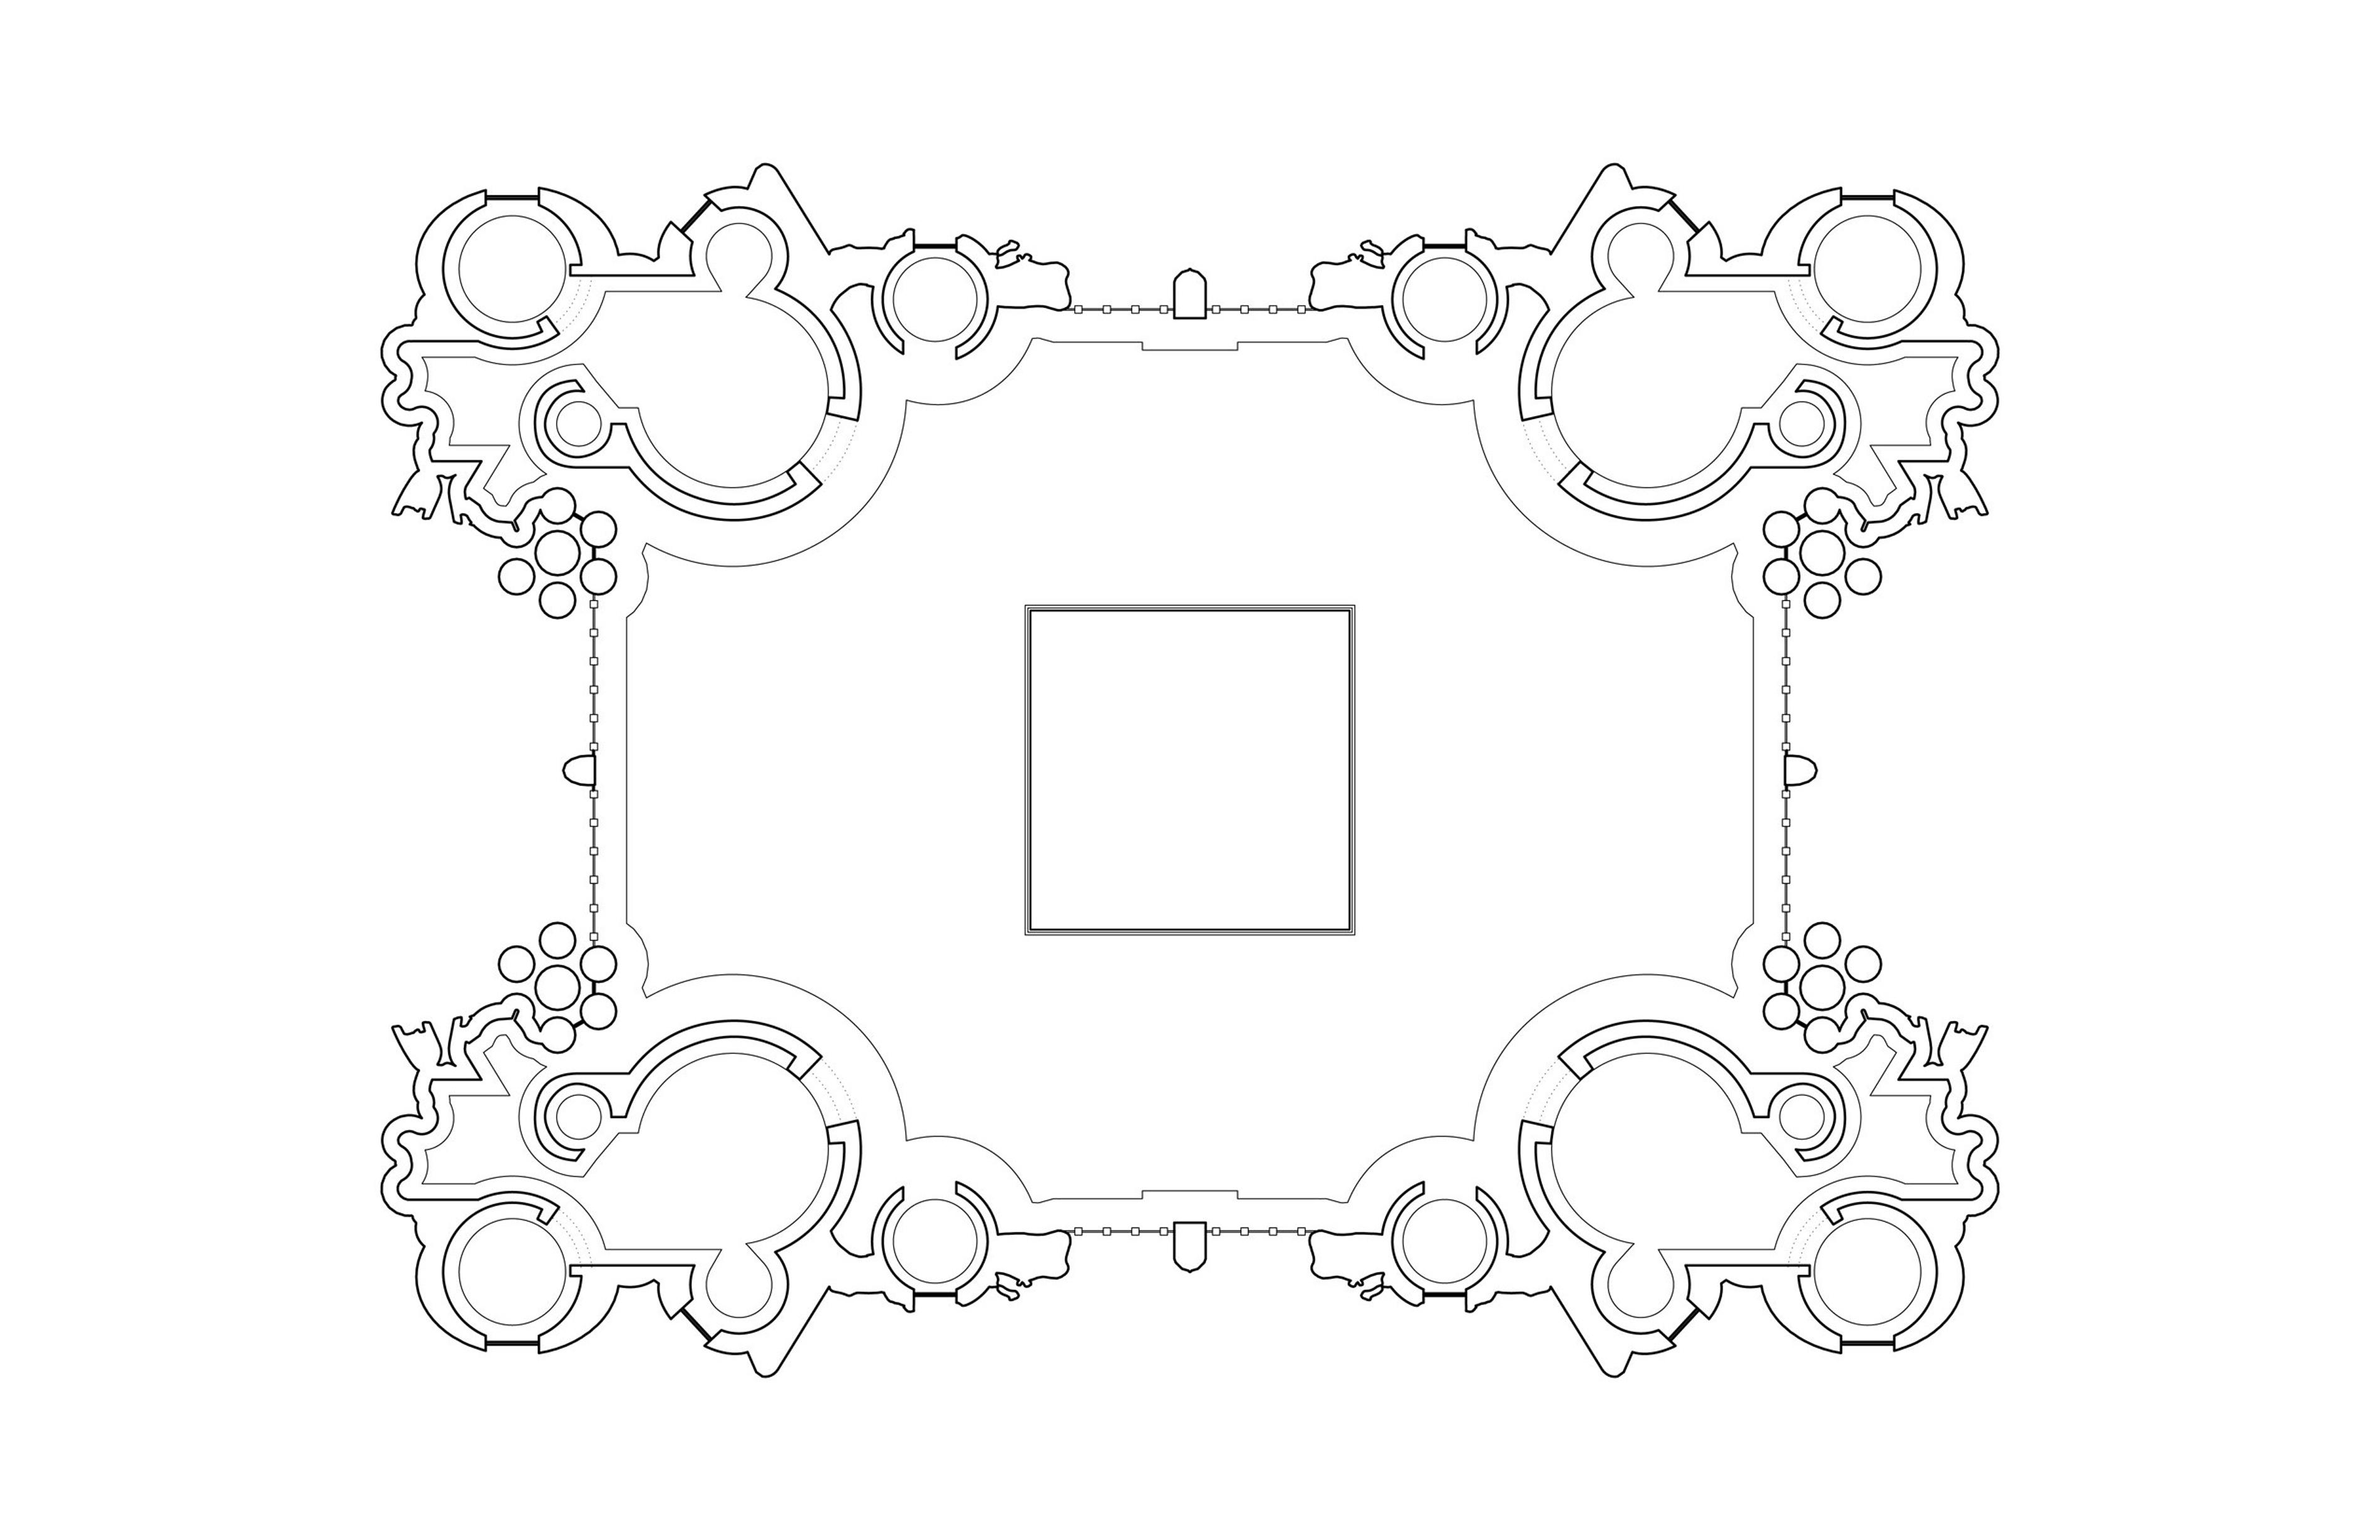 Chapter 01a Helsinki Guggenheim drawing plan 11 DONE_1